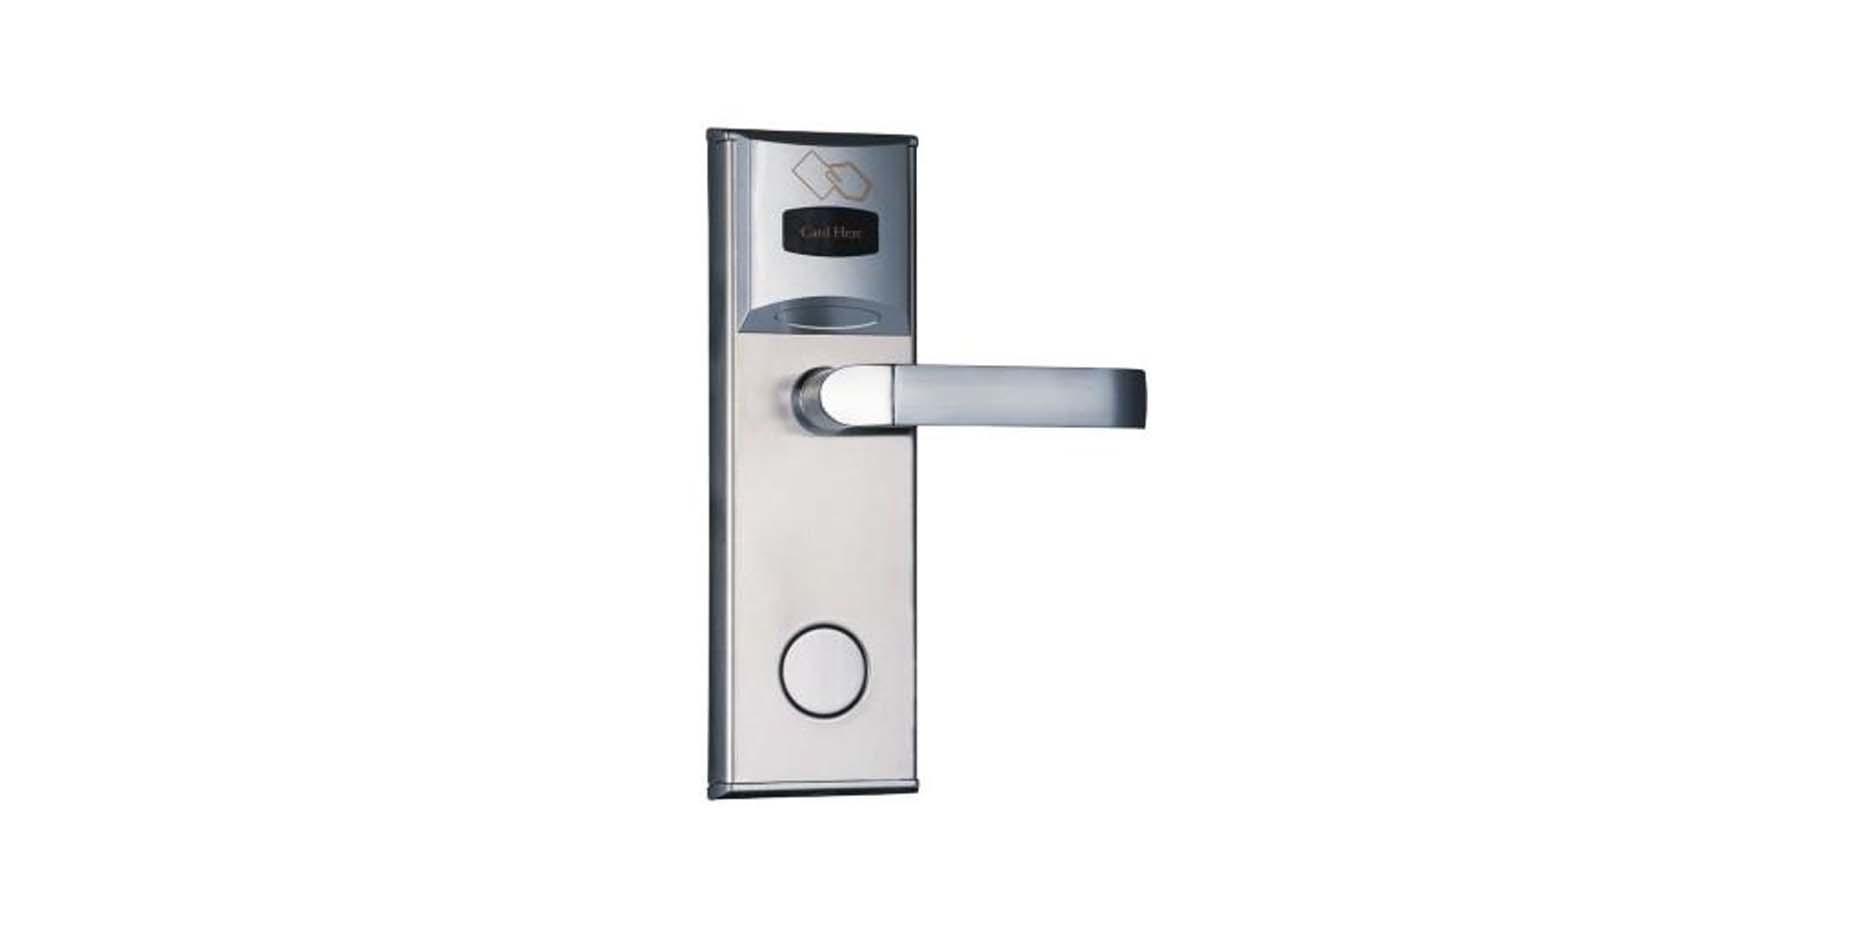 Harga Jual Solution L2 Door Fingerprint